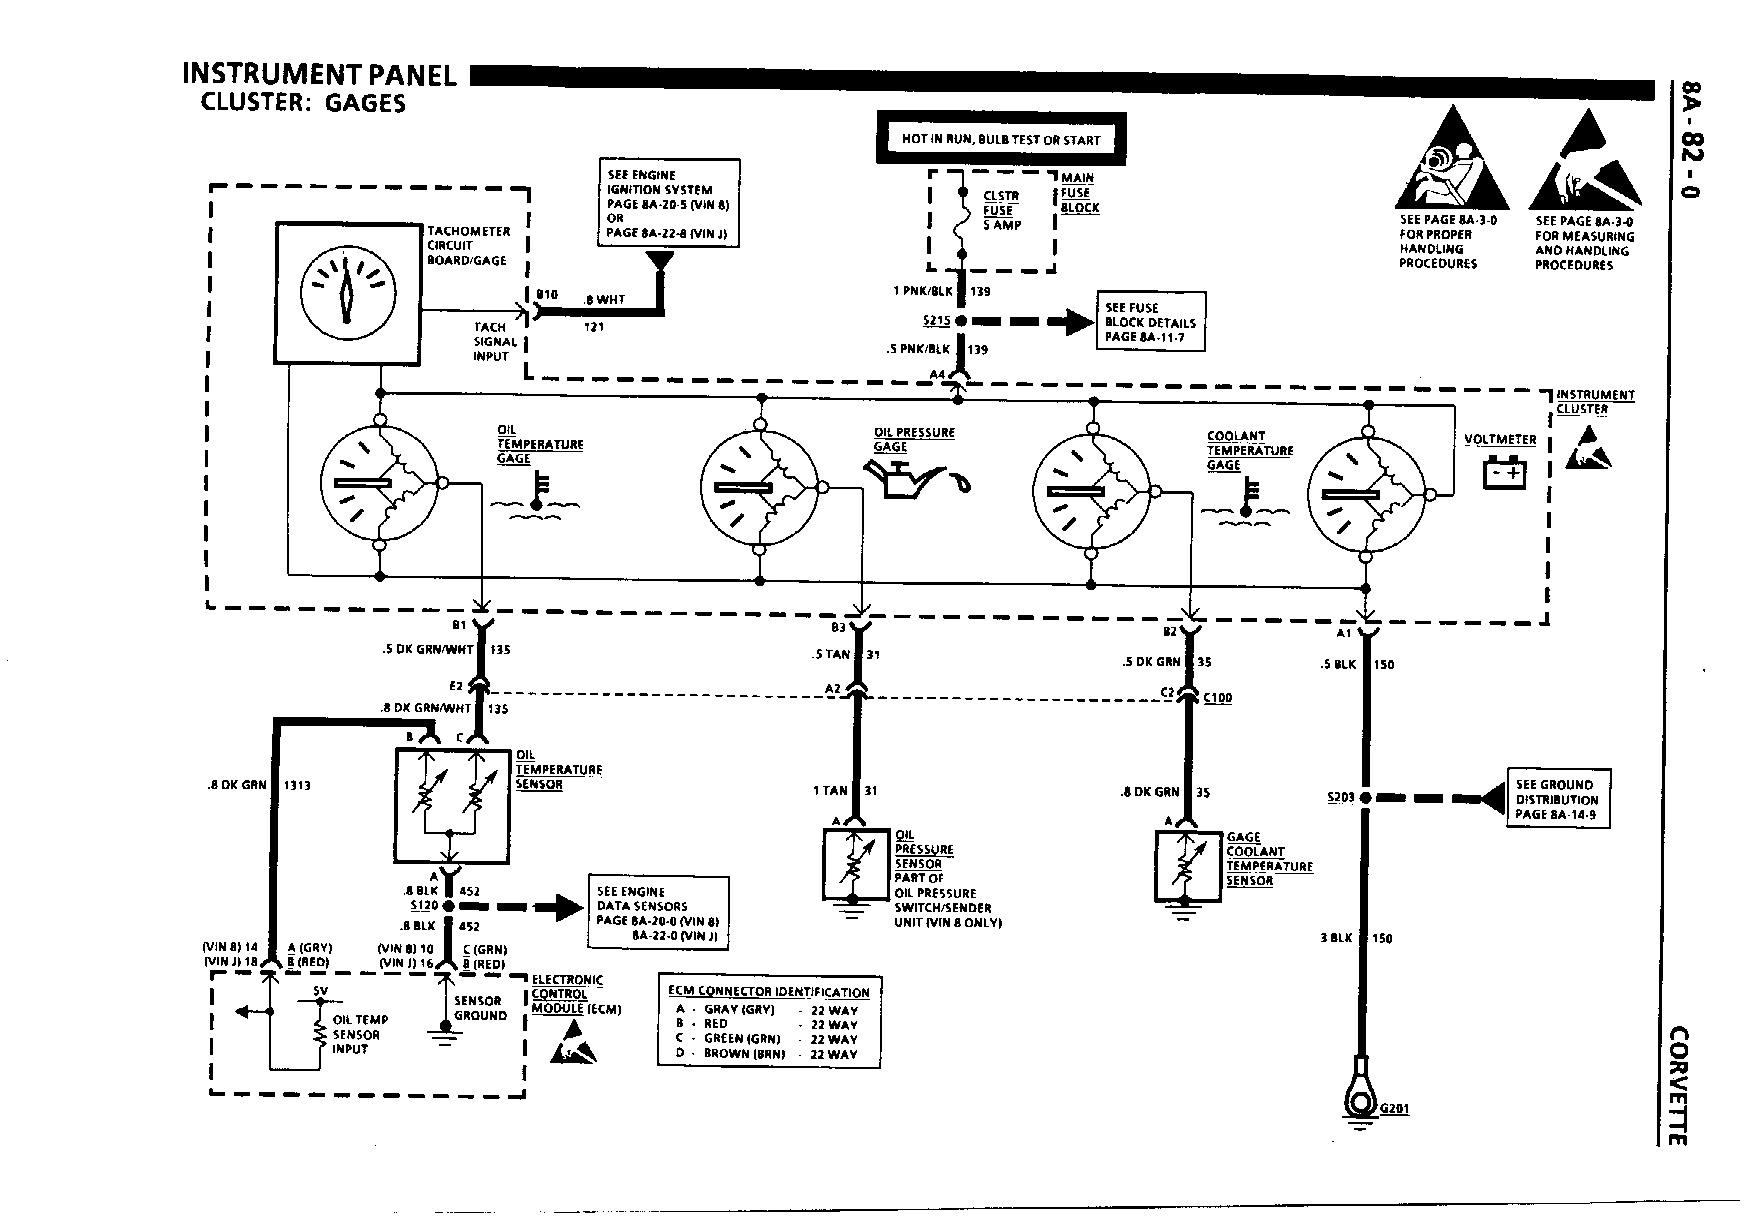 [DIAGRAM_5NL]  BM_6155] C3 Gauge Cluster Wiring Diagram Get Free Image About Wiring Diagram  Download Diagram | 1989 Corvette Wiring Diagrams |  | Www Mohammedshrine Librar Wiring 101